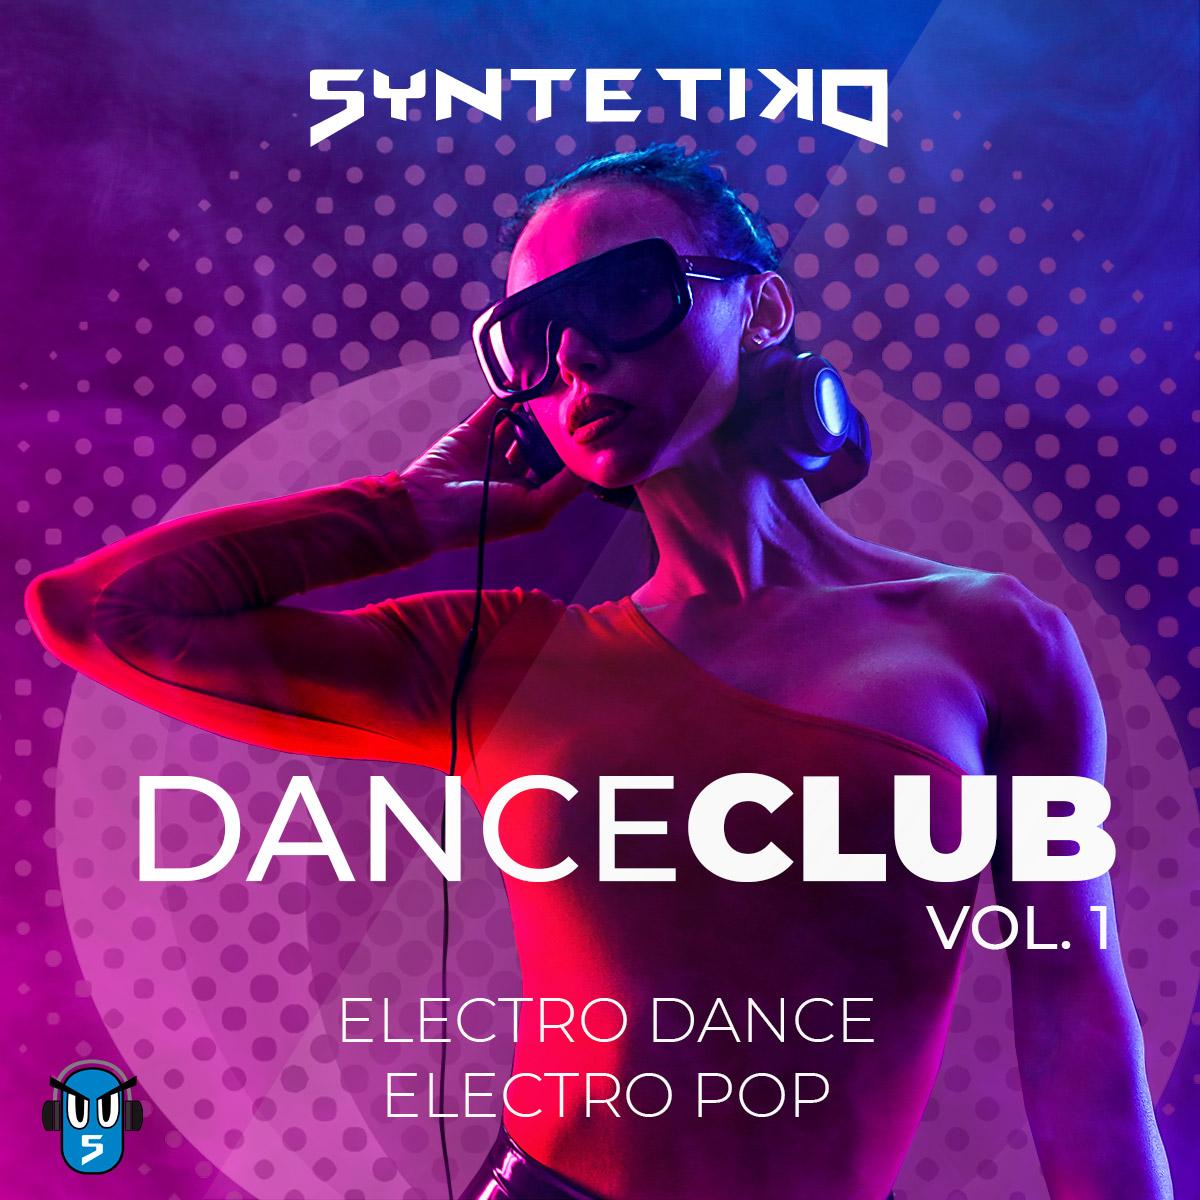 DanceCLUB Vol 1